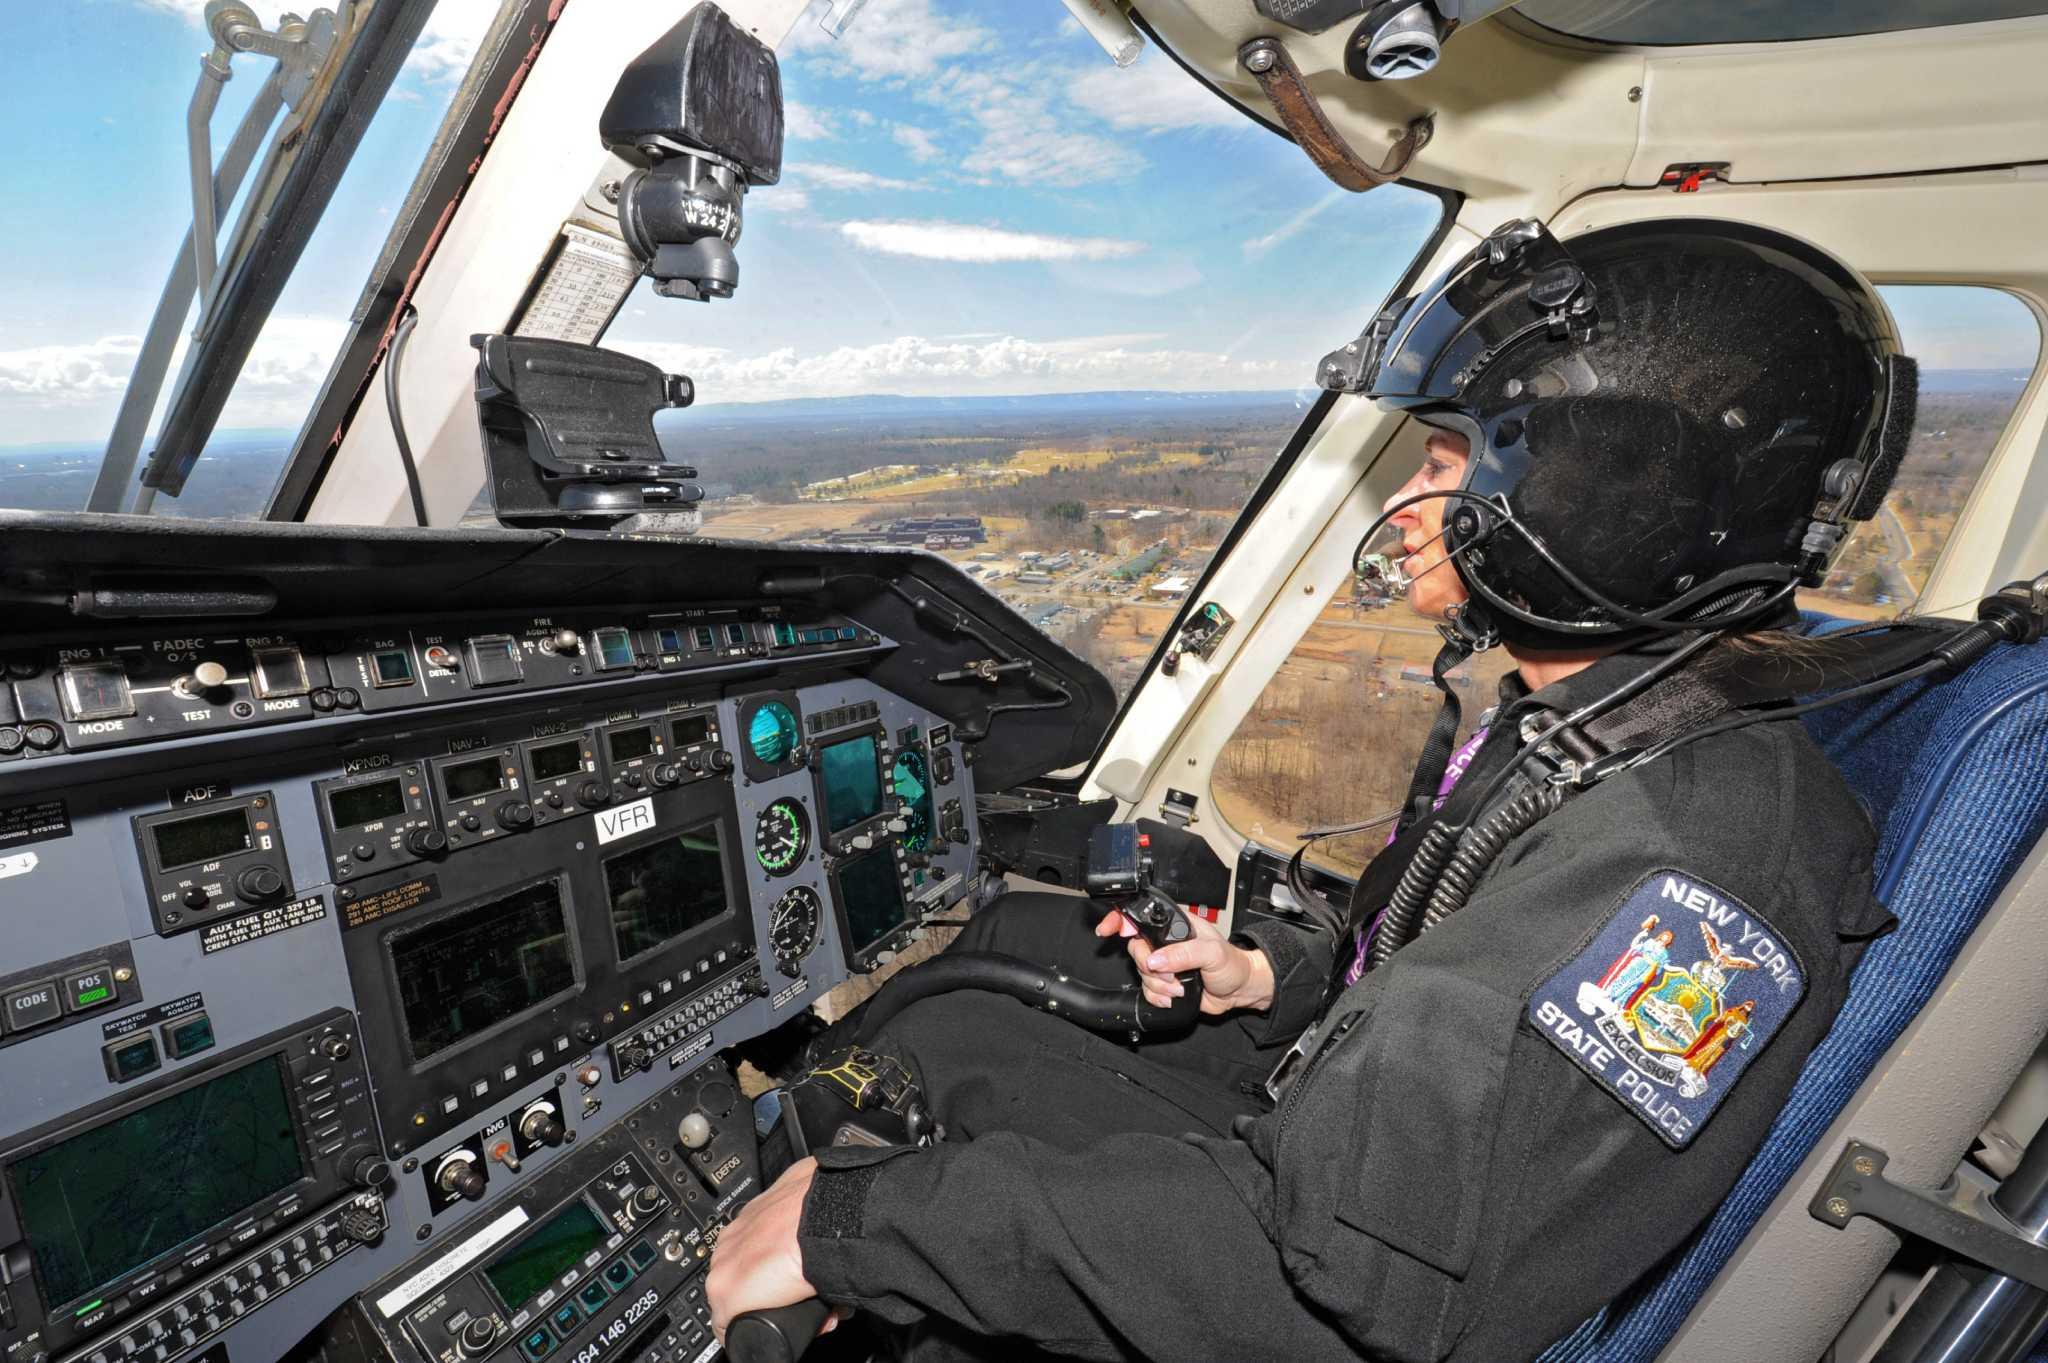 photos pioneering pilot paramedic times union